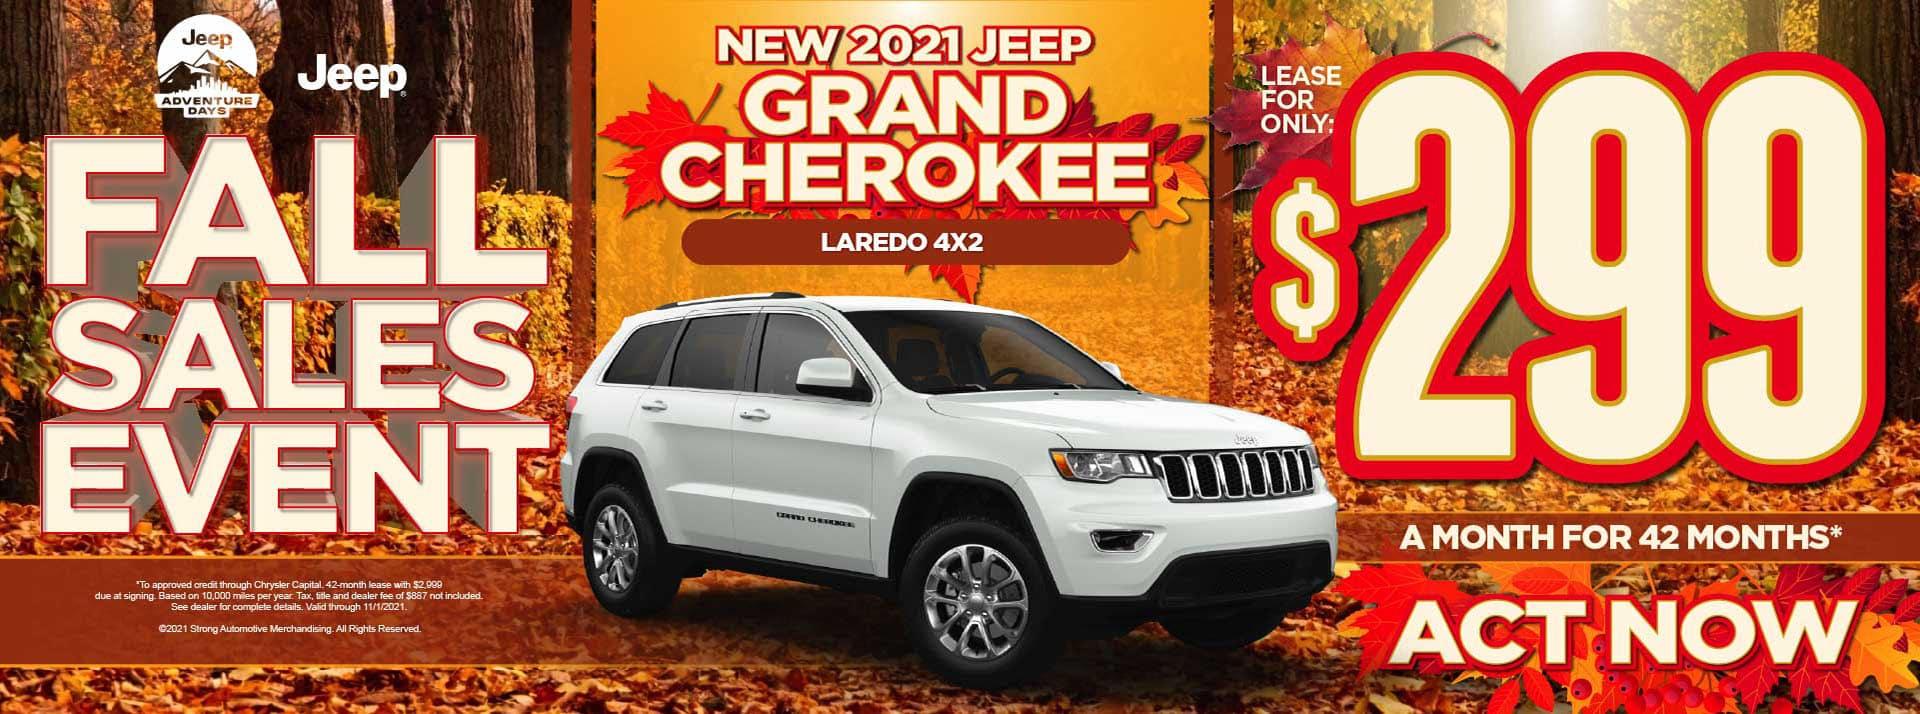 New 2021 Jeep Grand Cherokee Laredo 4x2 - $299 / mo ACT NOW